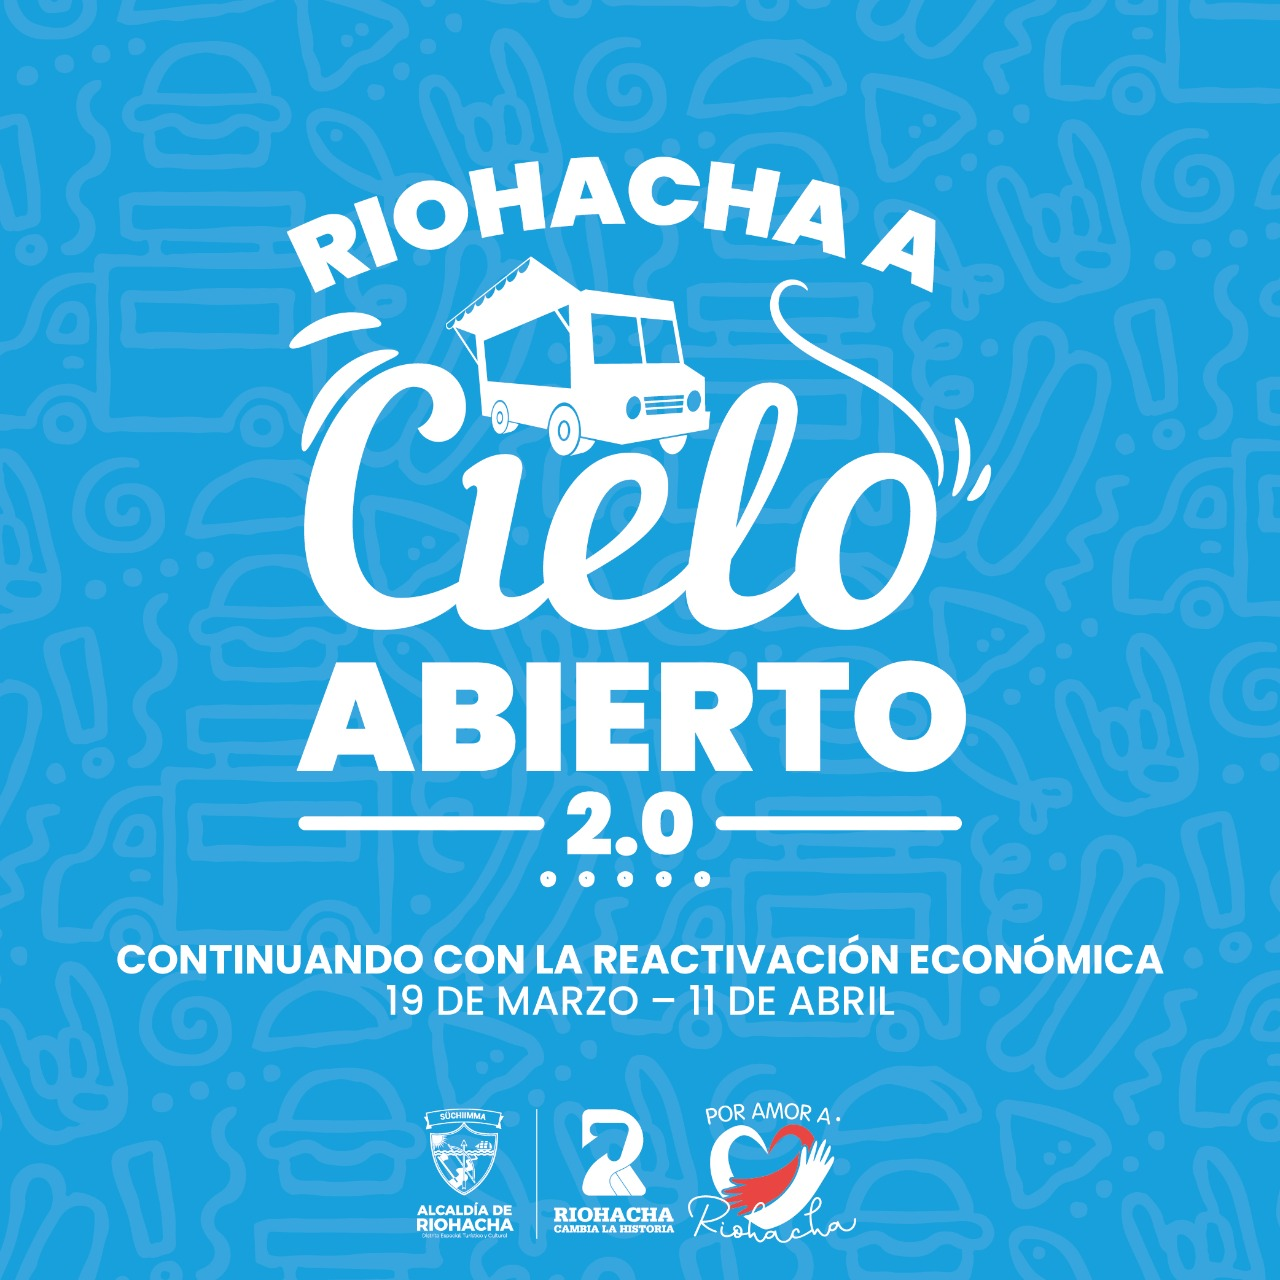 "hoyennoticia.com, ""Riohacha a Cielo Abierto 2.0"", para seguir reactivando la economía"